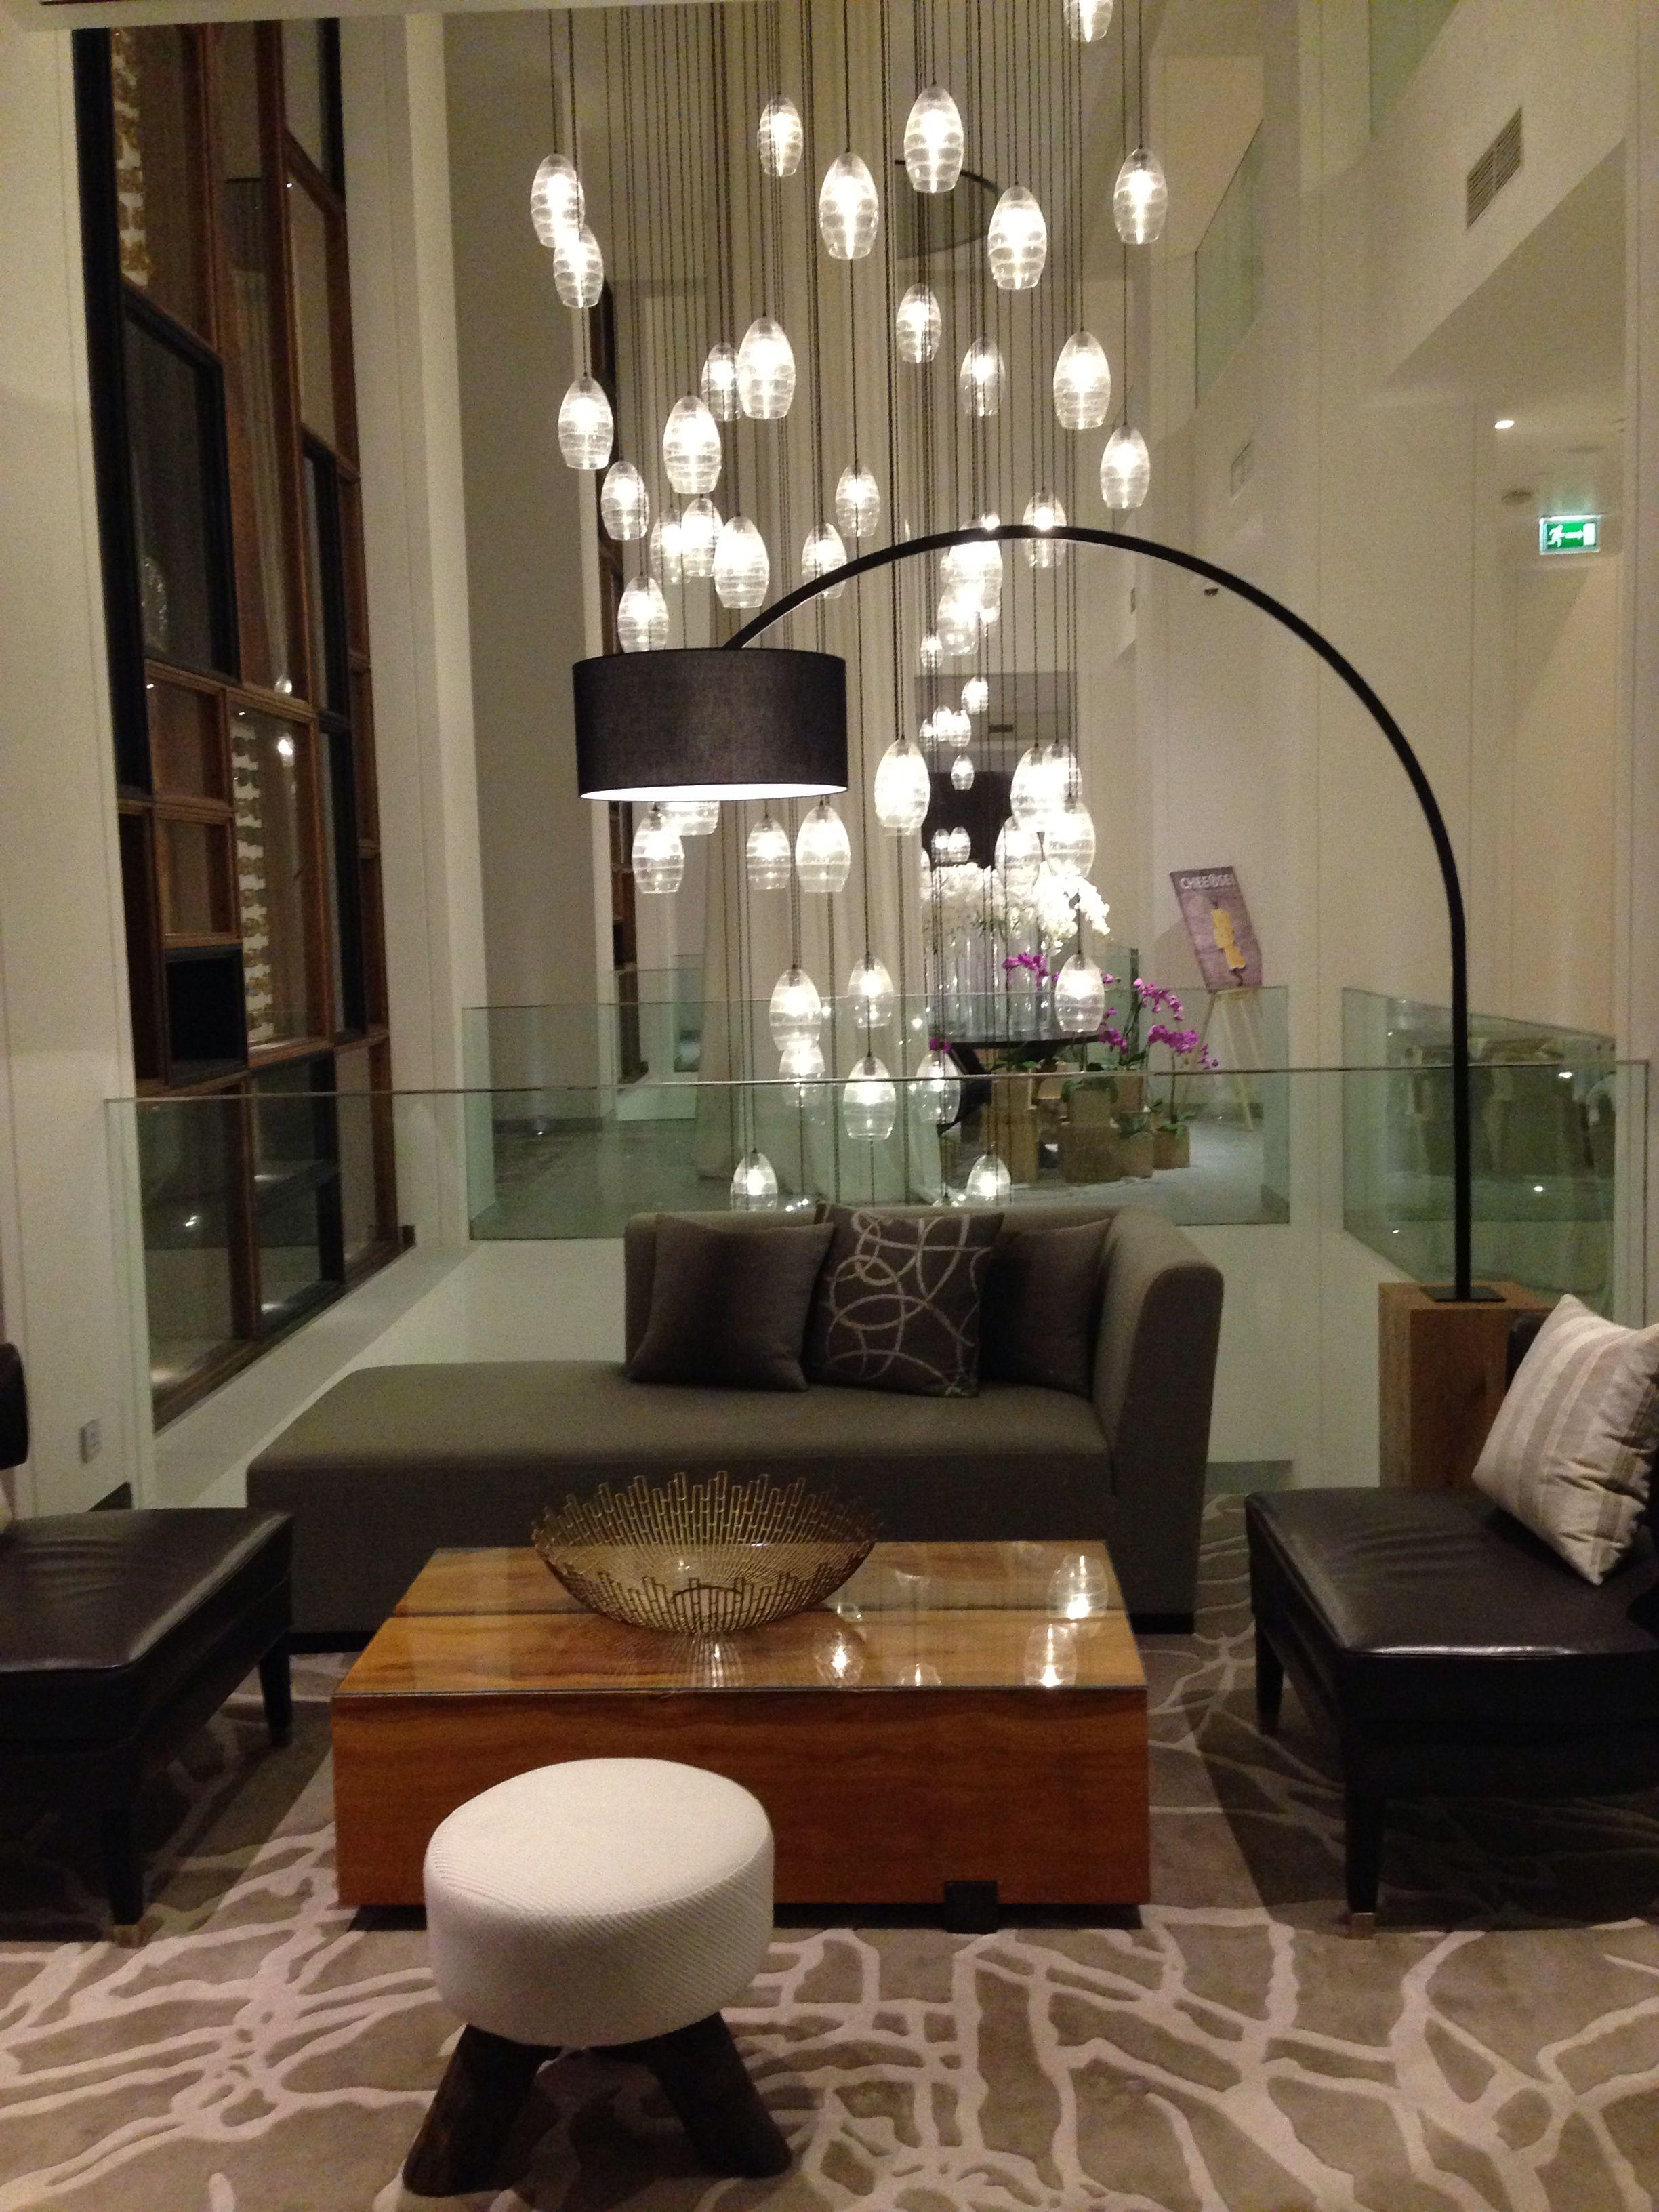 Vida Hotels Lobby Dubai Oit Likes Travelling